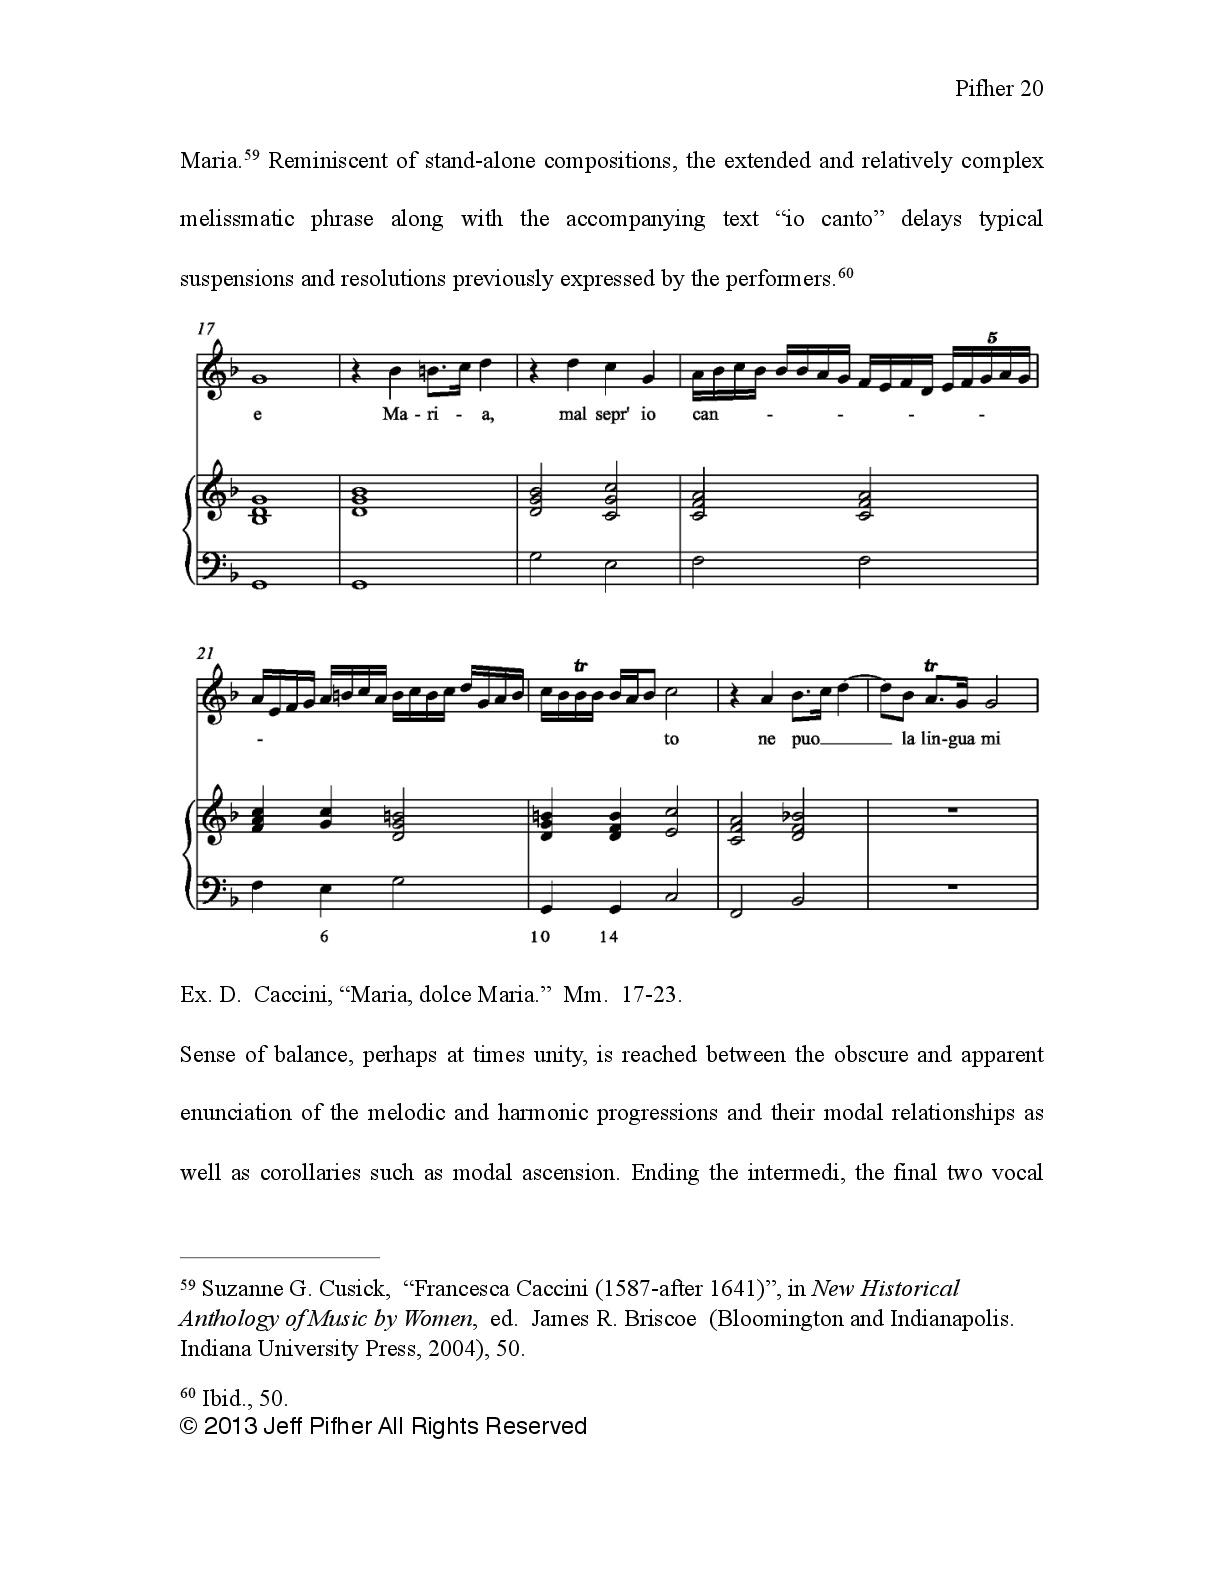 Jeff-Pifher-Music-and-Mediciean-Influences-(Academic-Series)-020.jpg